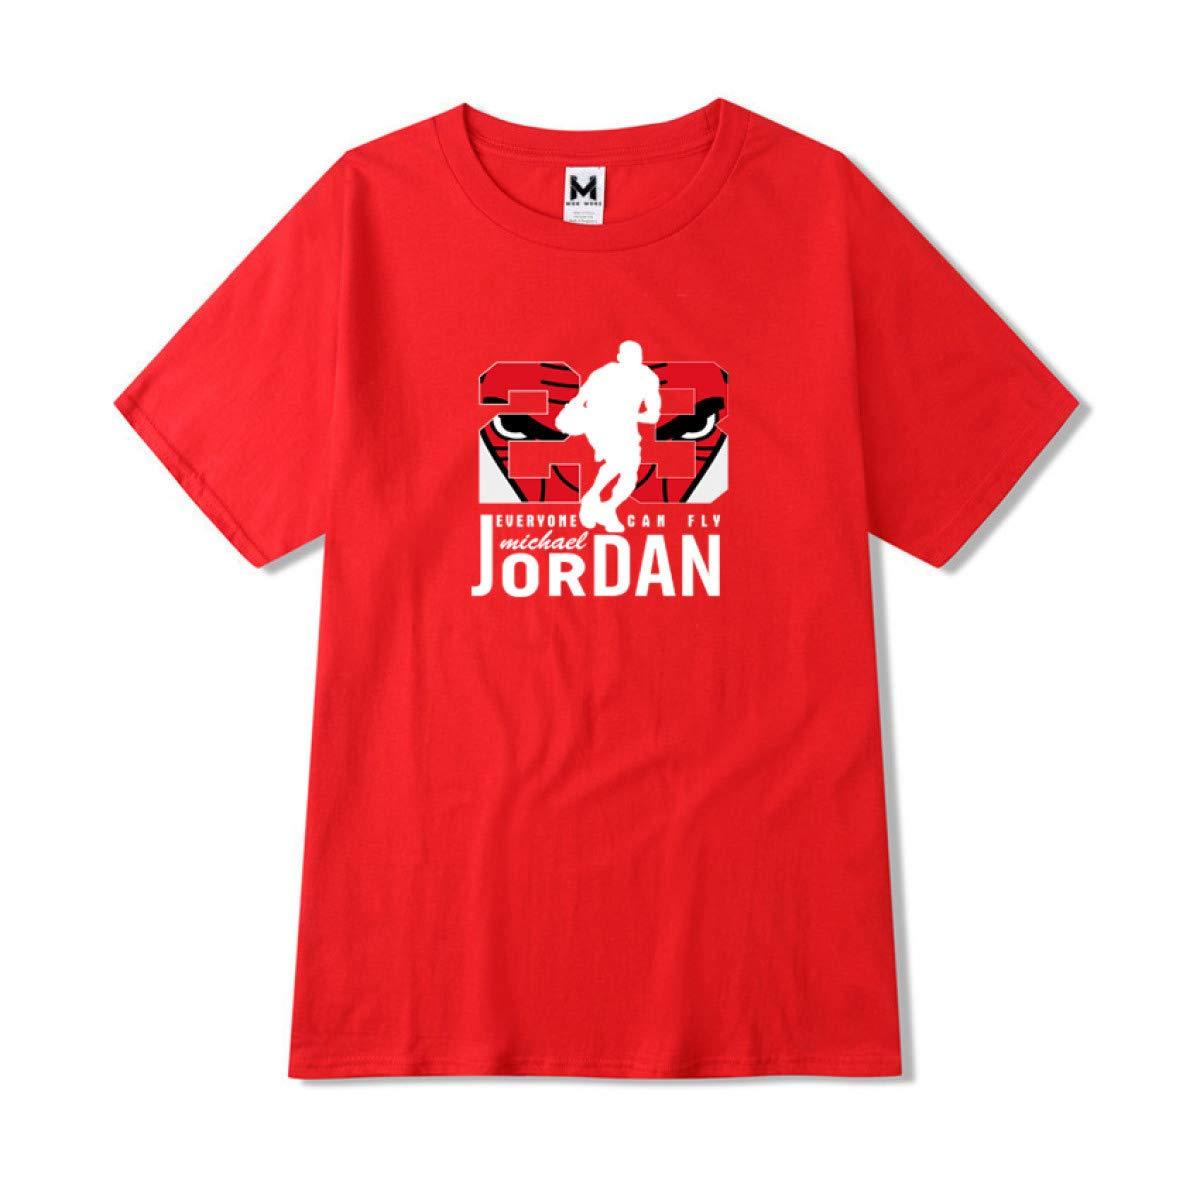 9b86f27c24f0 Amazon.com  Jordan 23 T Shirt Cotton Men t Shirt Man Round Collar Large  Code T-Shirt  Clothing